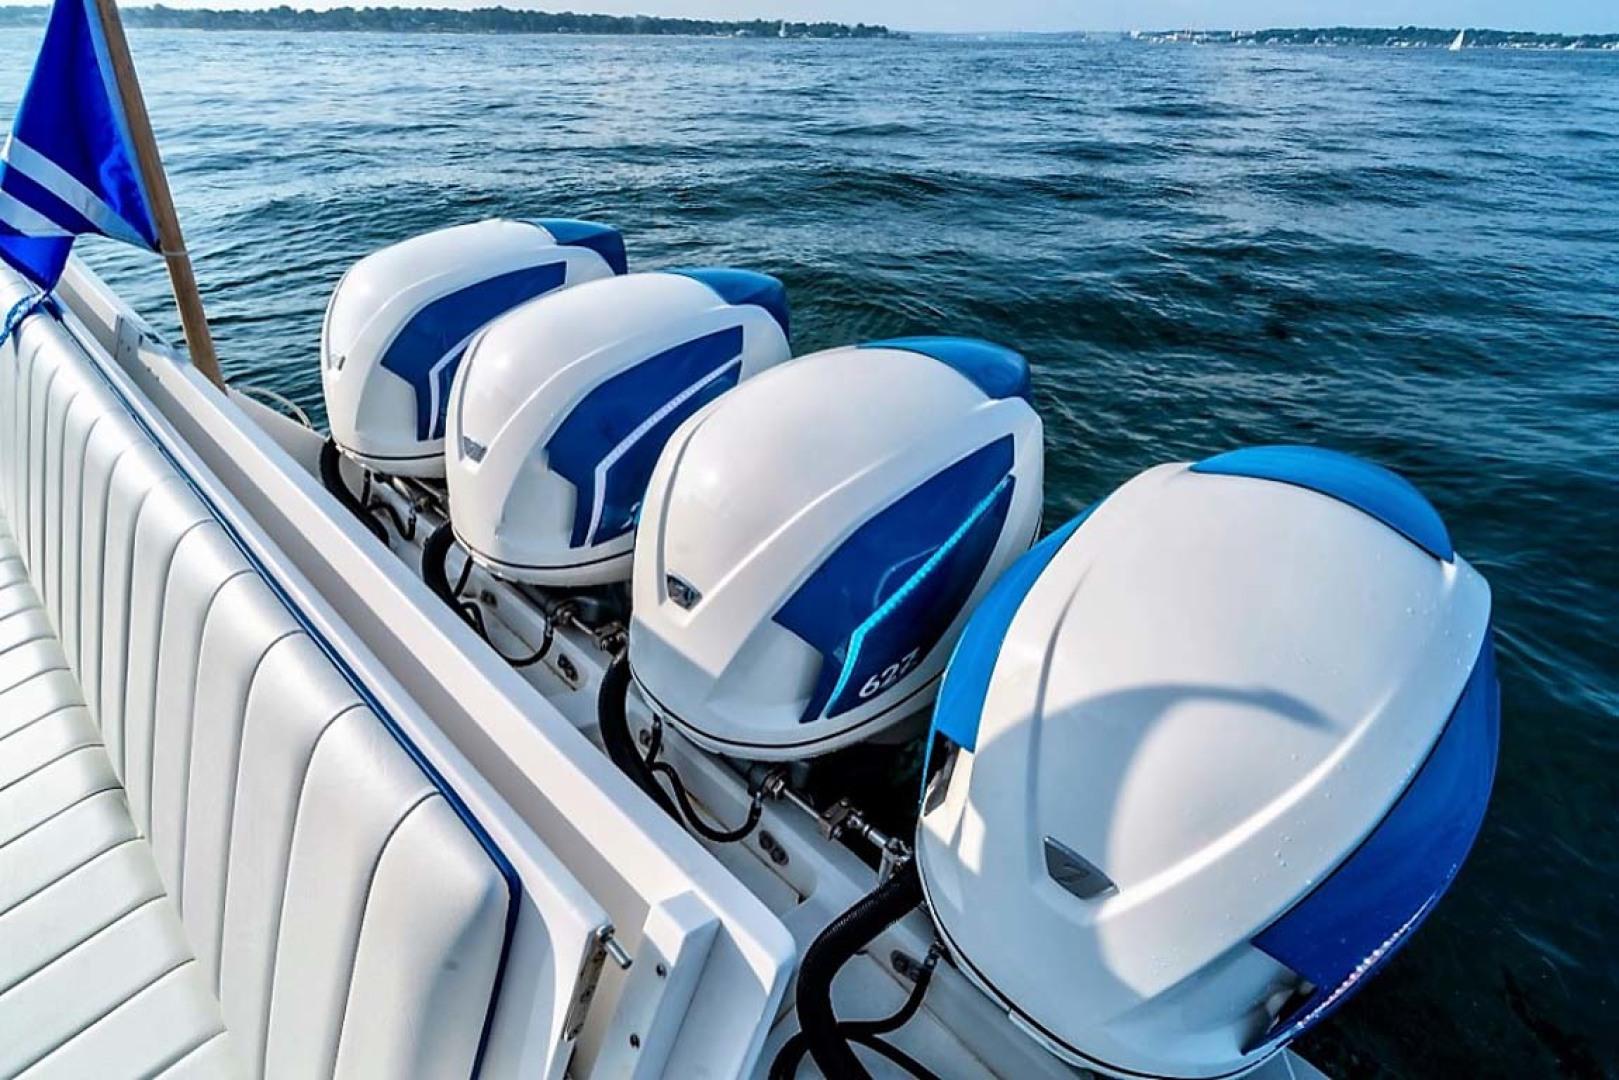 Intrepid-475 Sport Yacht 2015-Elaine Niantic-Connecticut-United States-Quad Engines-1191919 | Thumbnail